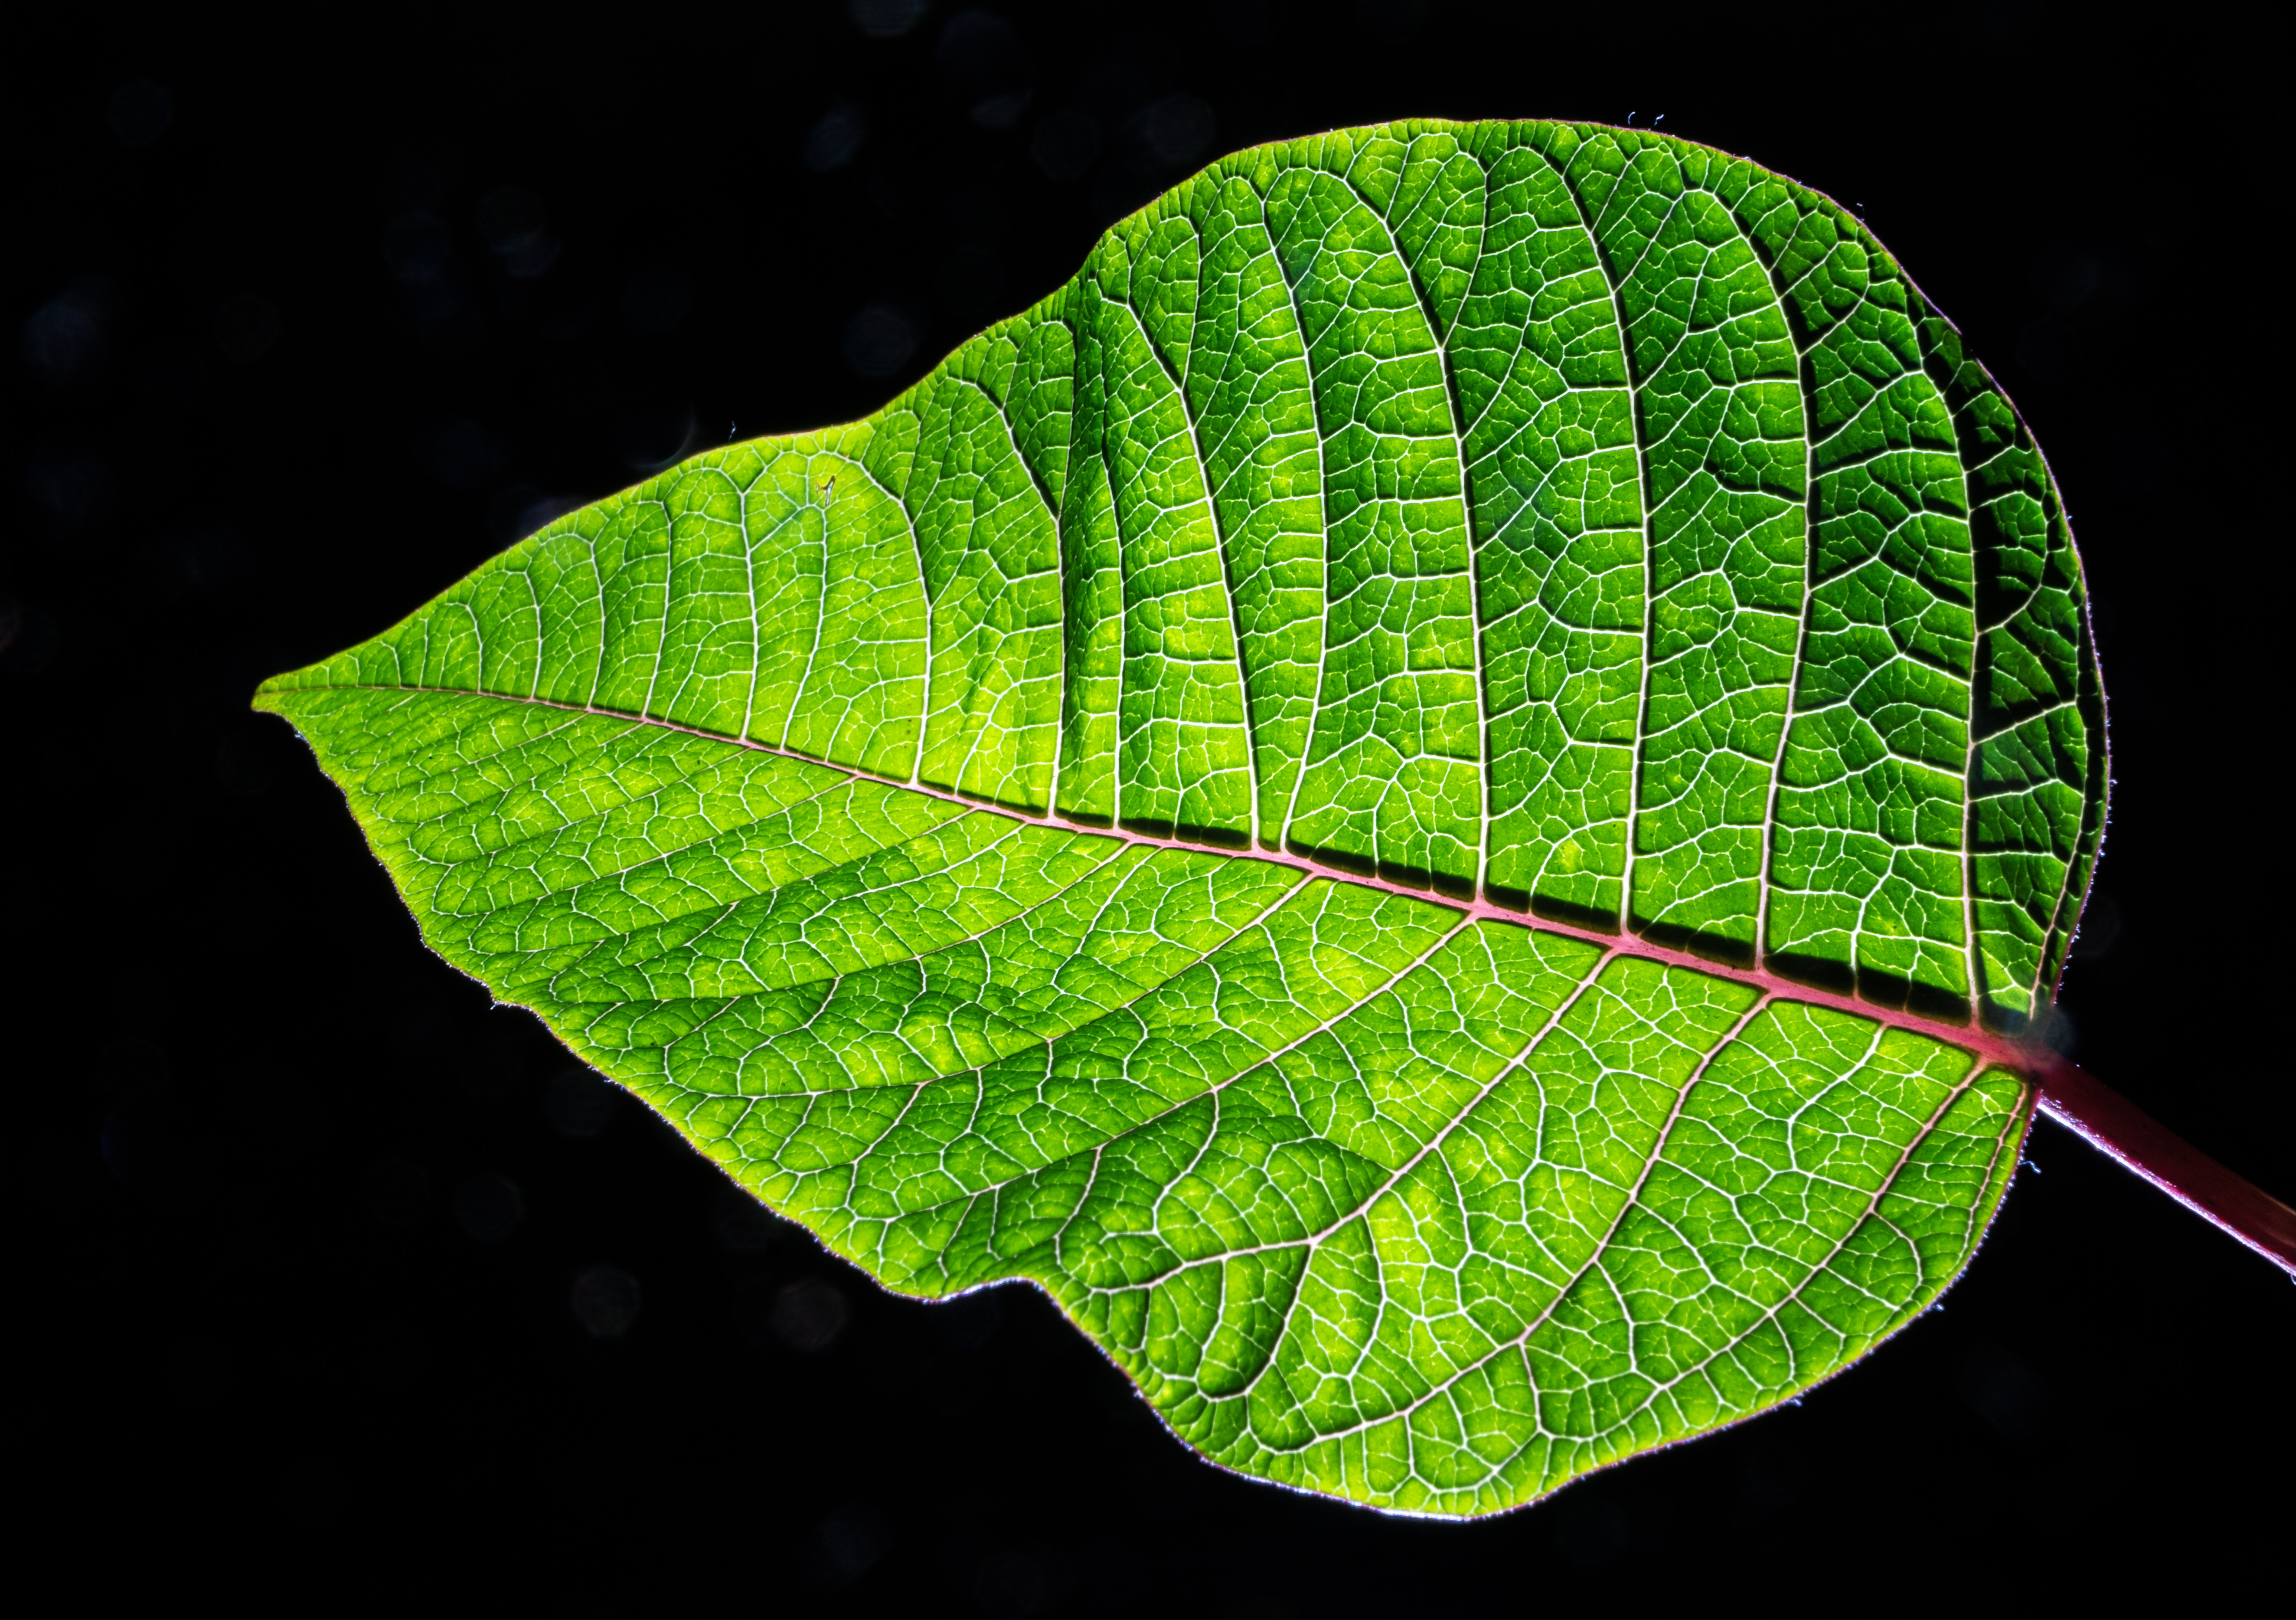 Green Leaf Plant · Free Stock Photo